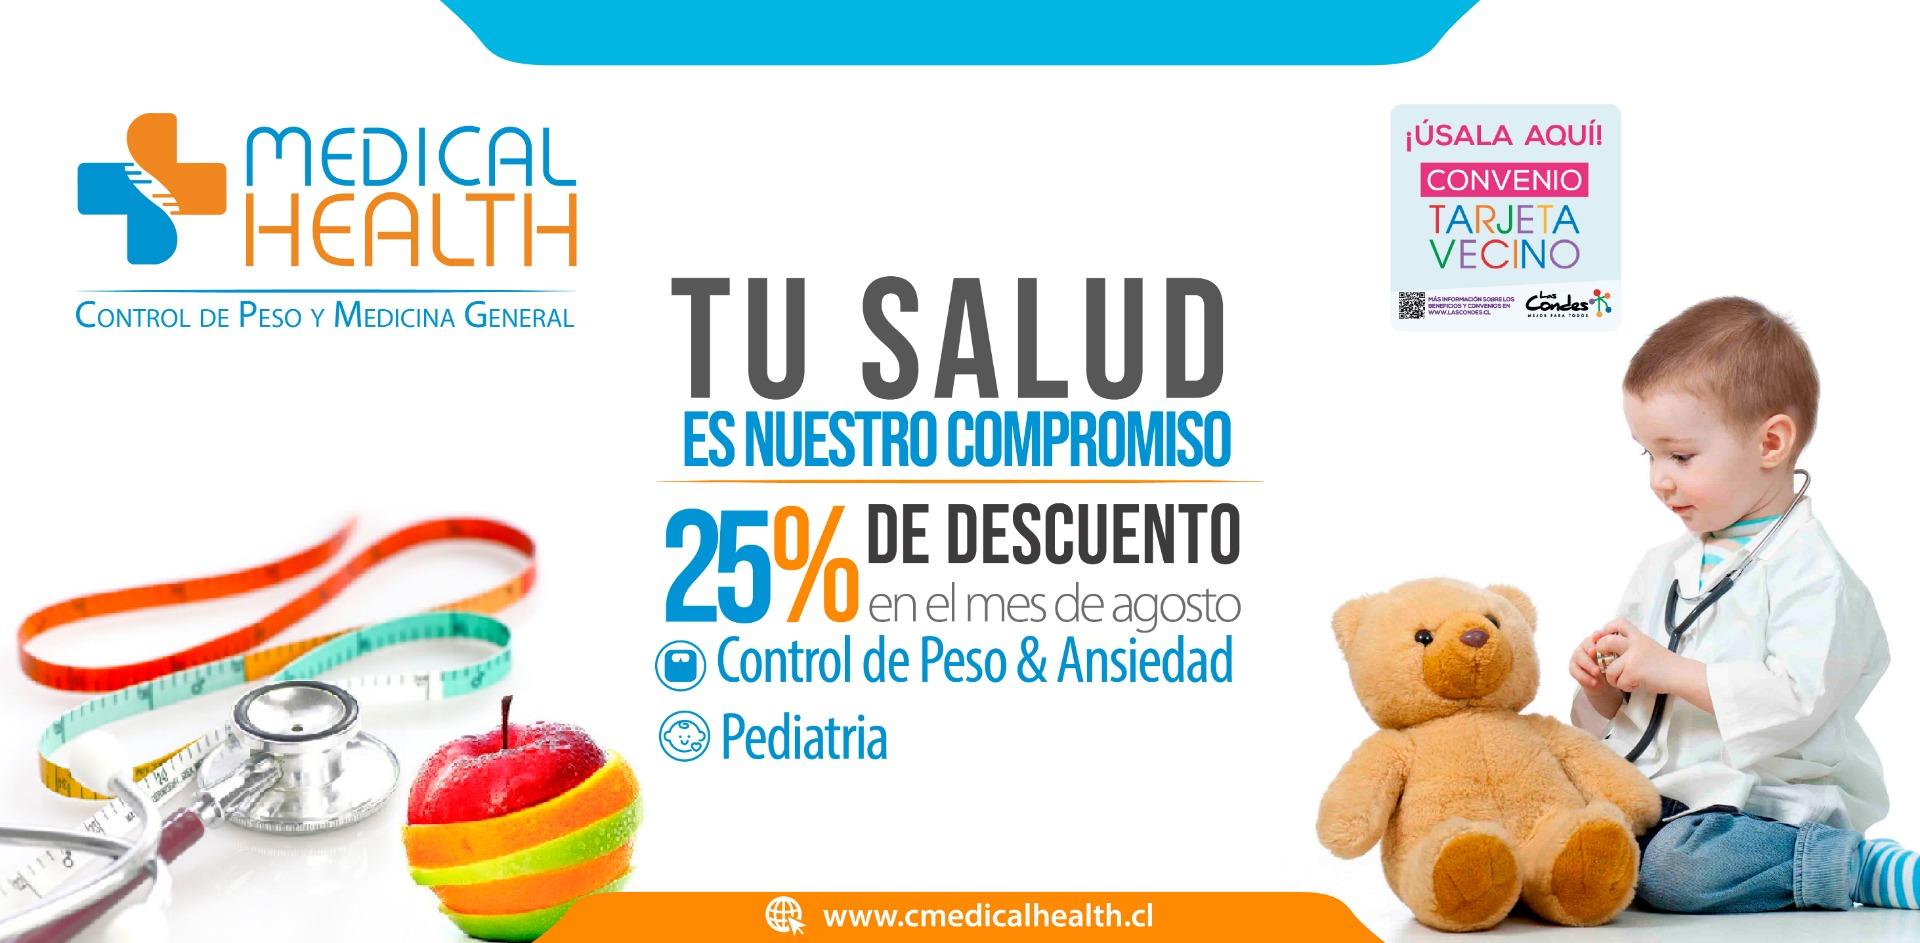 MEDICAL HEALTH PROMO